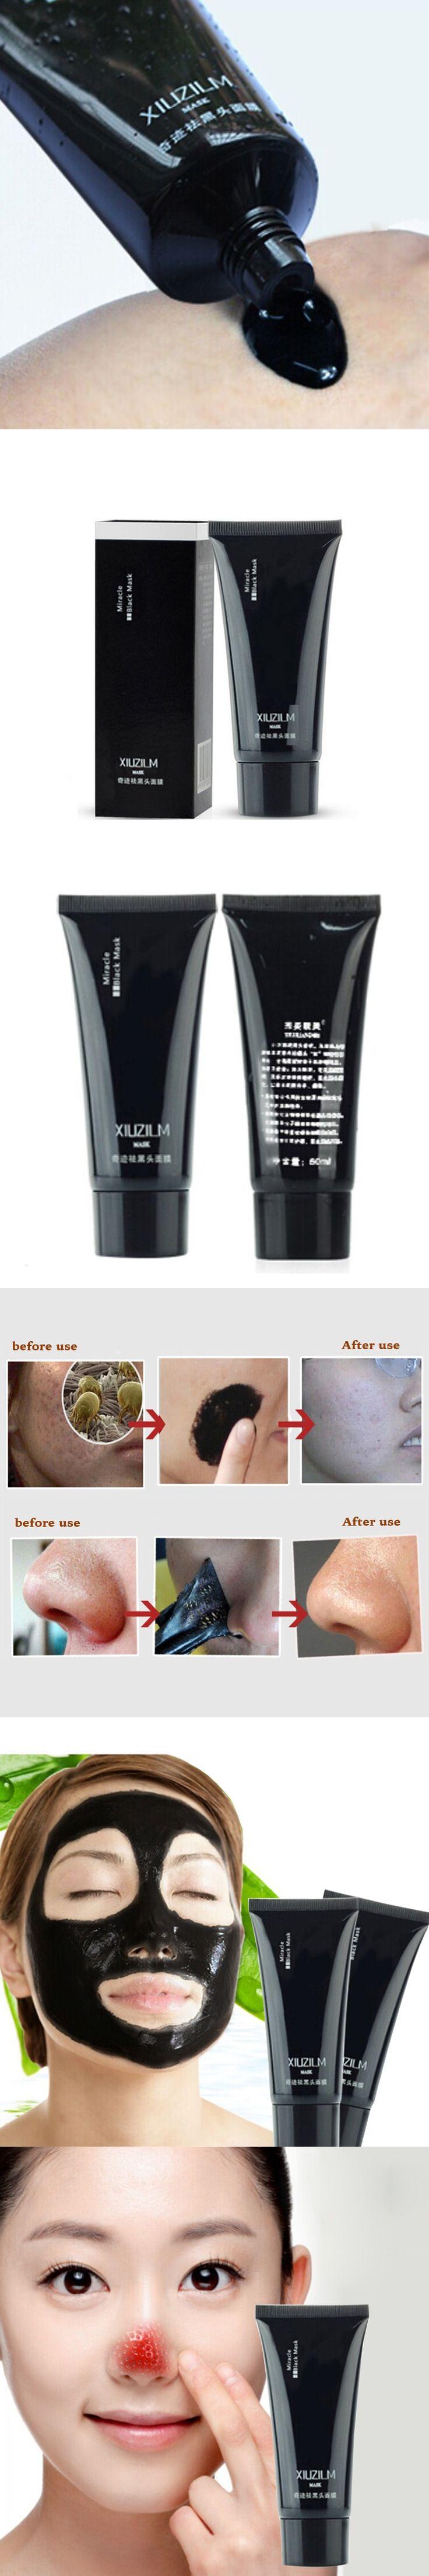 1Pcs 60G Suction Black Mask For Face Acne Blackhead Remover Black Head Pore Nose Strip Black Dots Mask Peel Off Face Masks